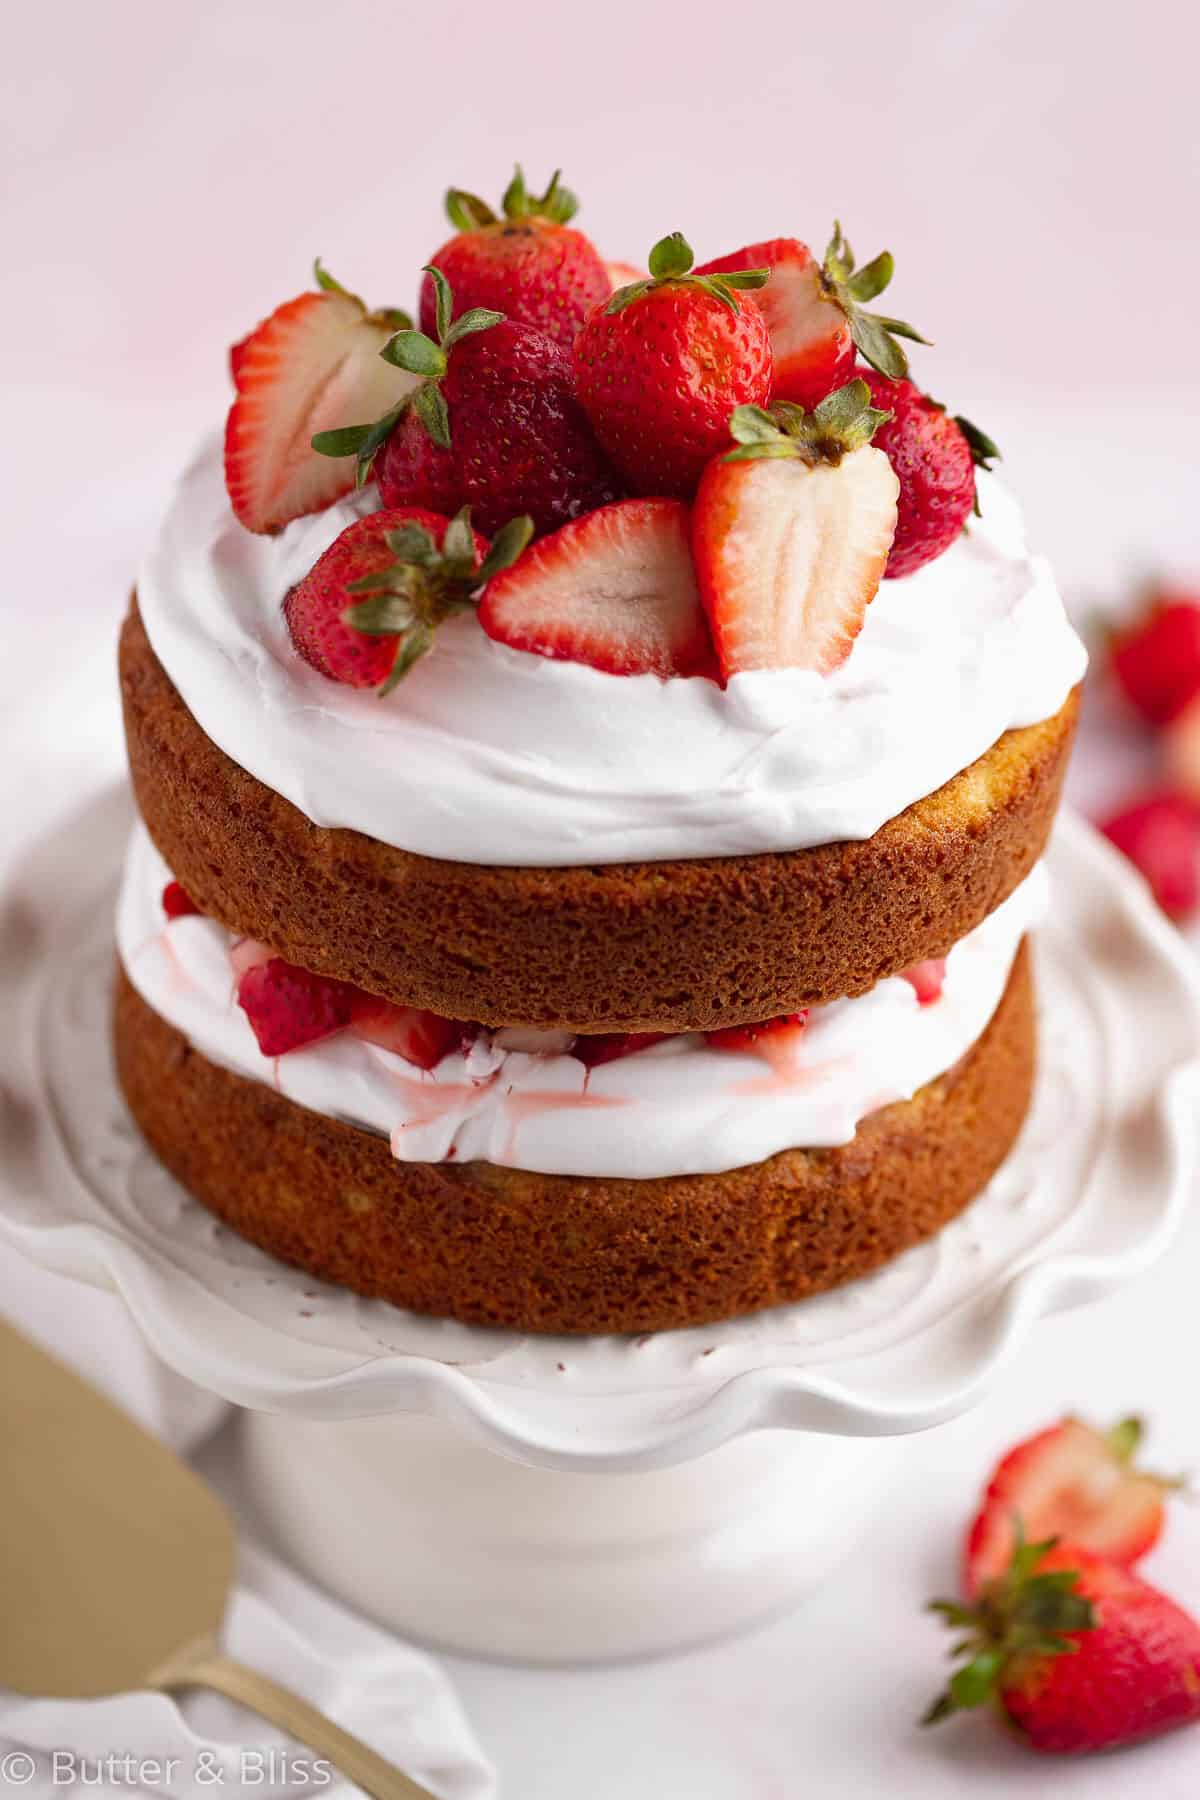 Mini strawberry shortcake cake with fresh strawberries